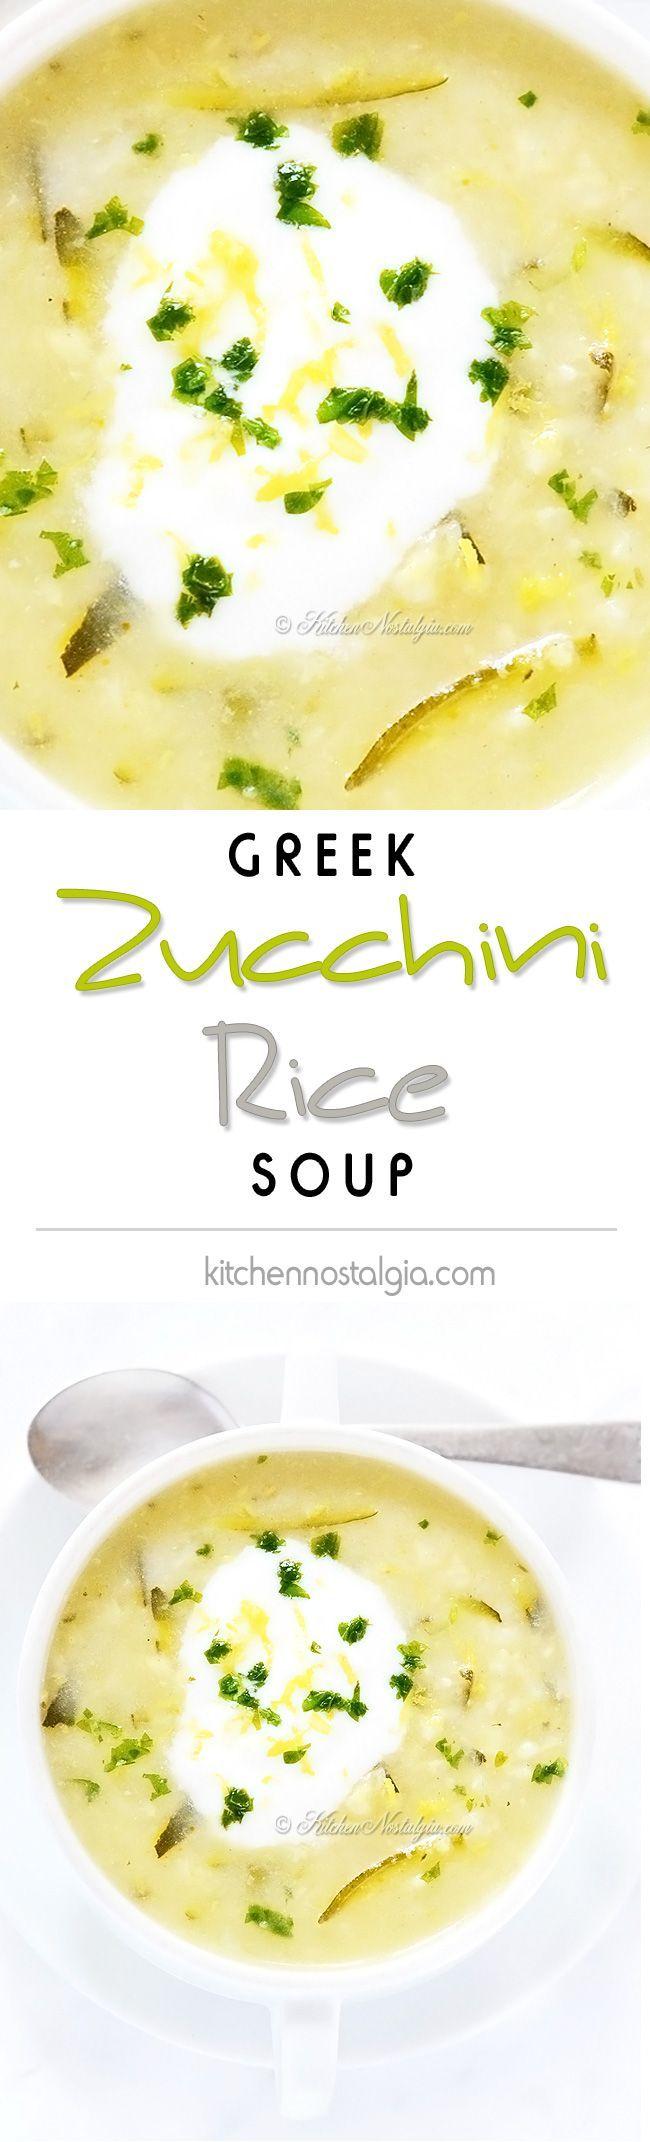 Zucchini Rice Soup - Greek summer soup, seasoned with lemon zest, lemon juice and rosemary; can be vegetarian / vegan - kitchennostalgia.com